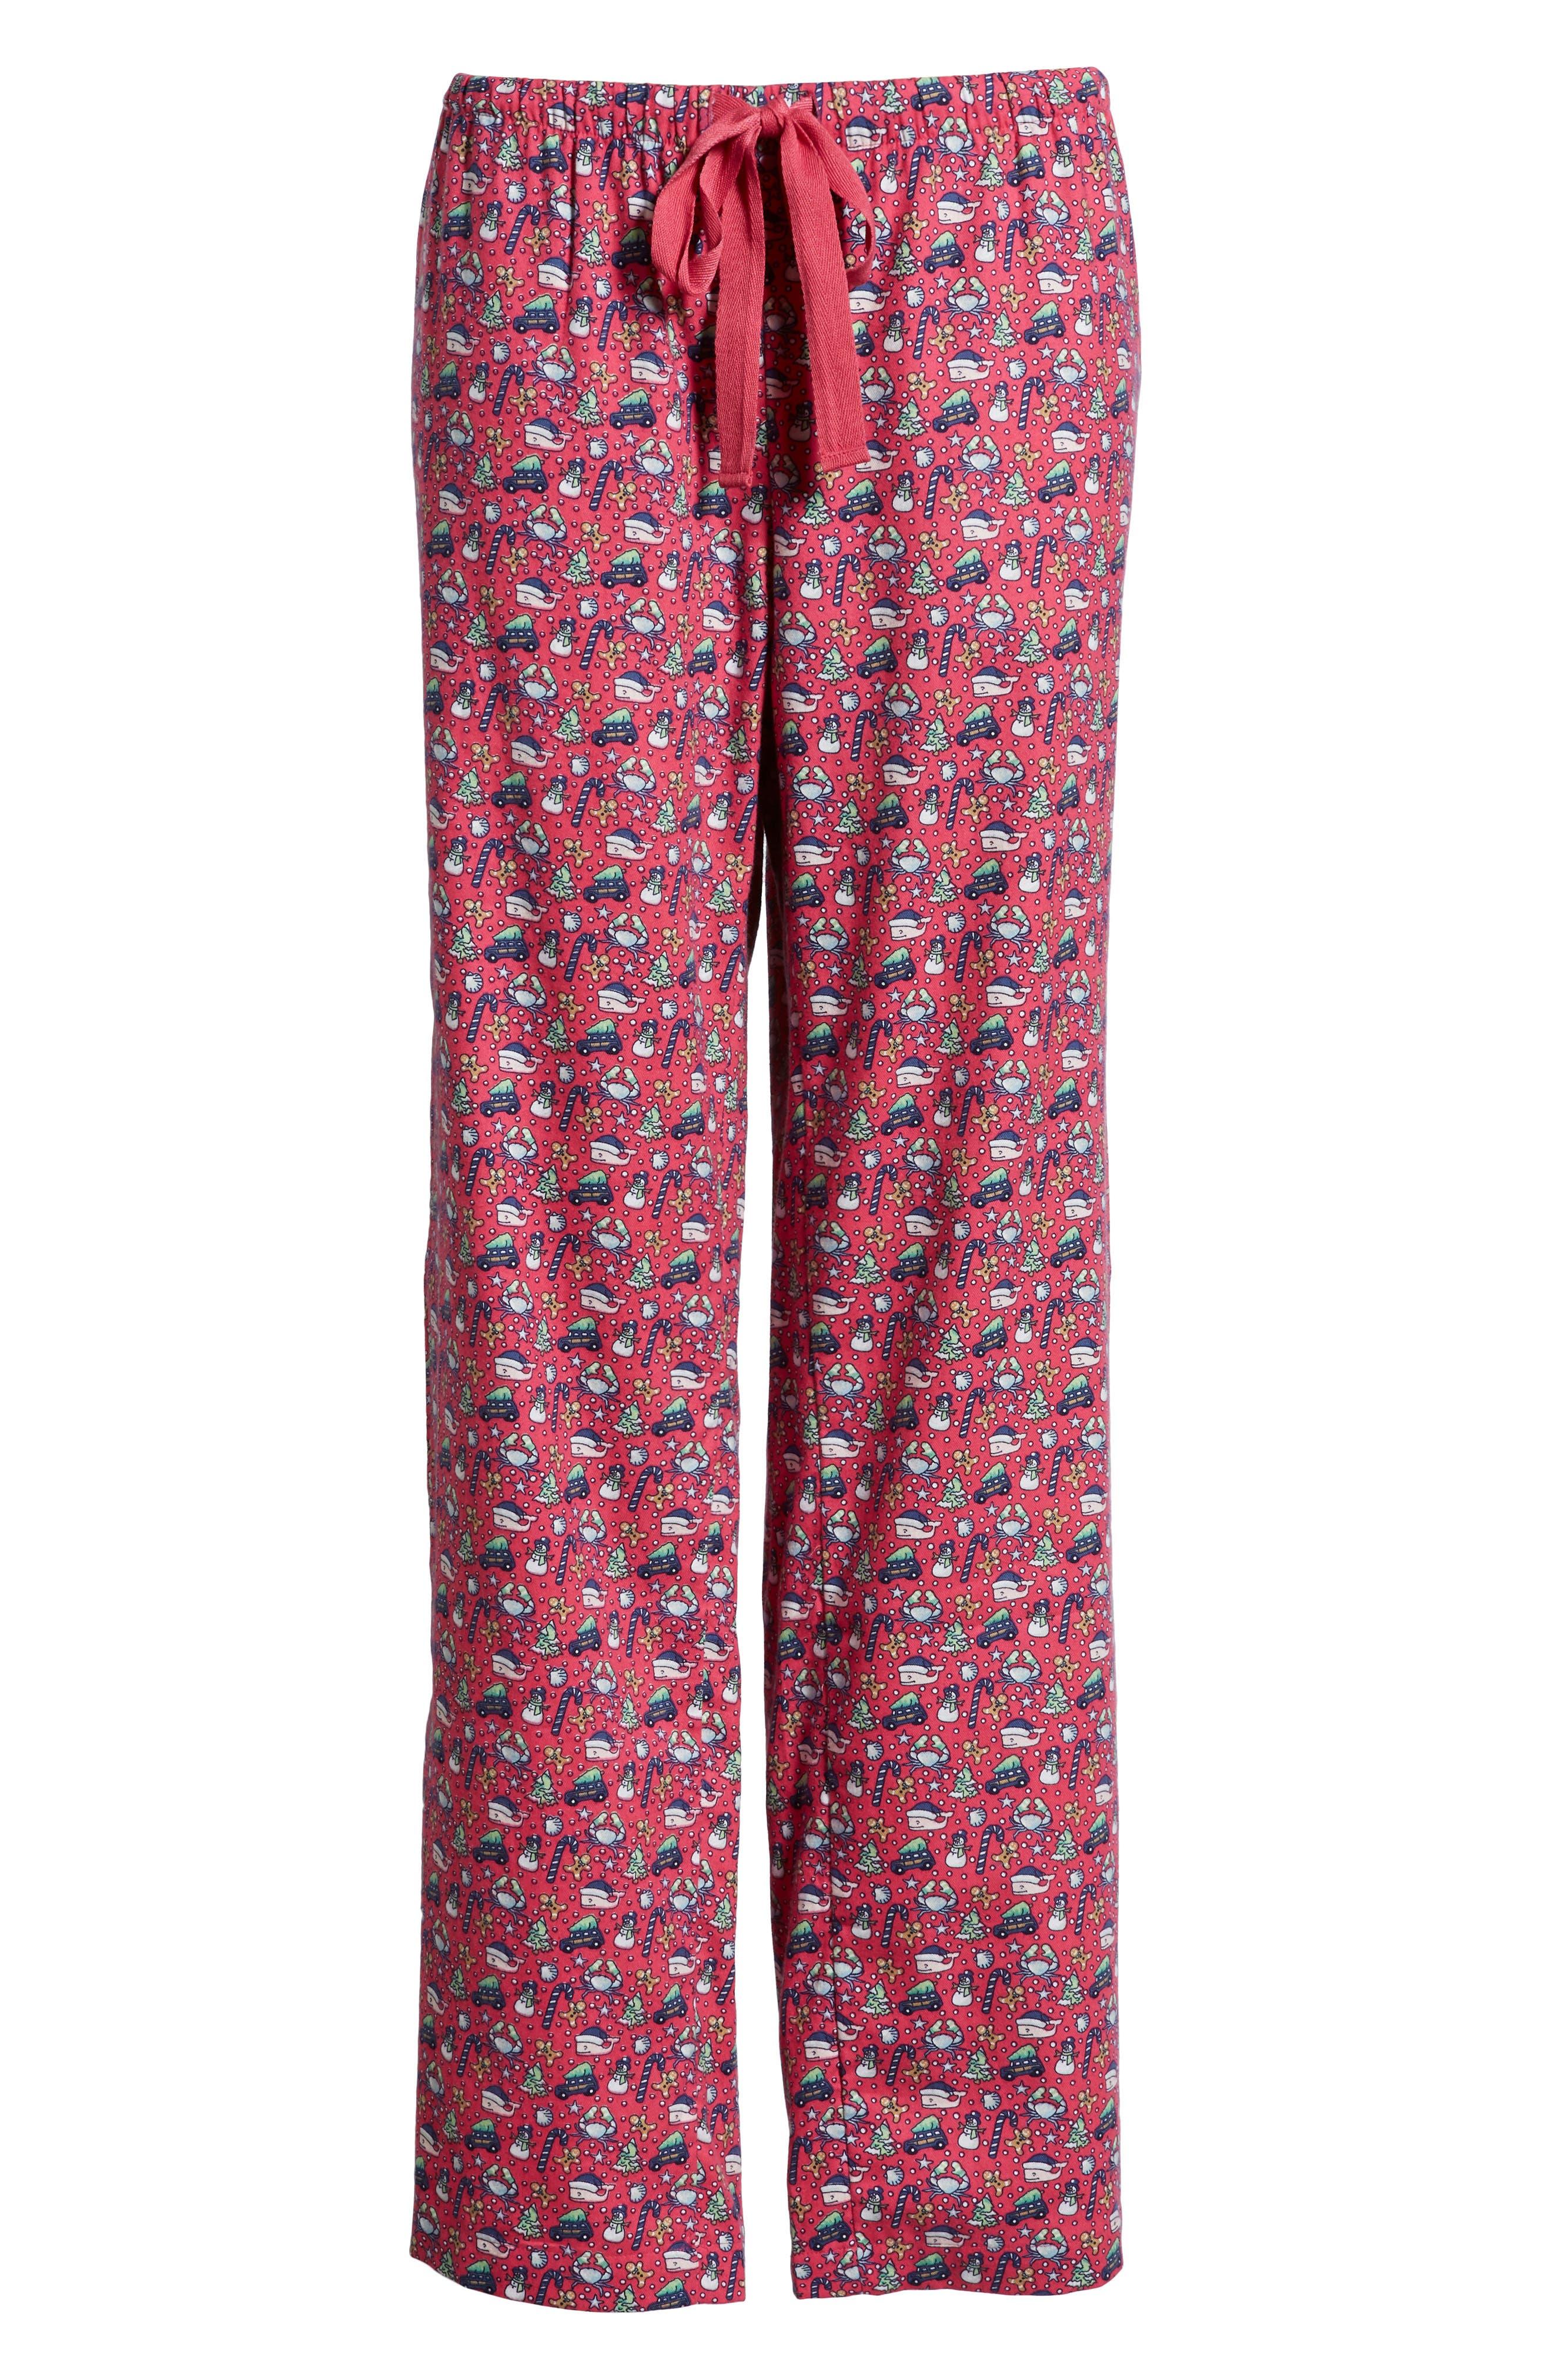 Holiday Print Lounge Pants,                             Alternate thumbnail 6, color,                             GOJI BERRY